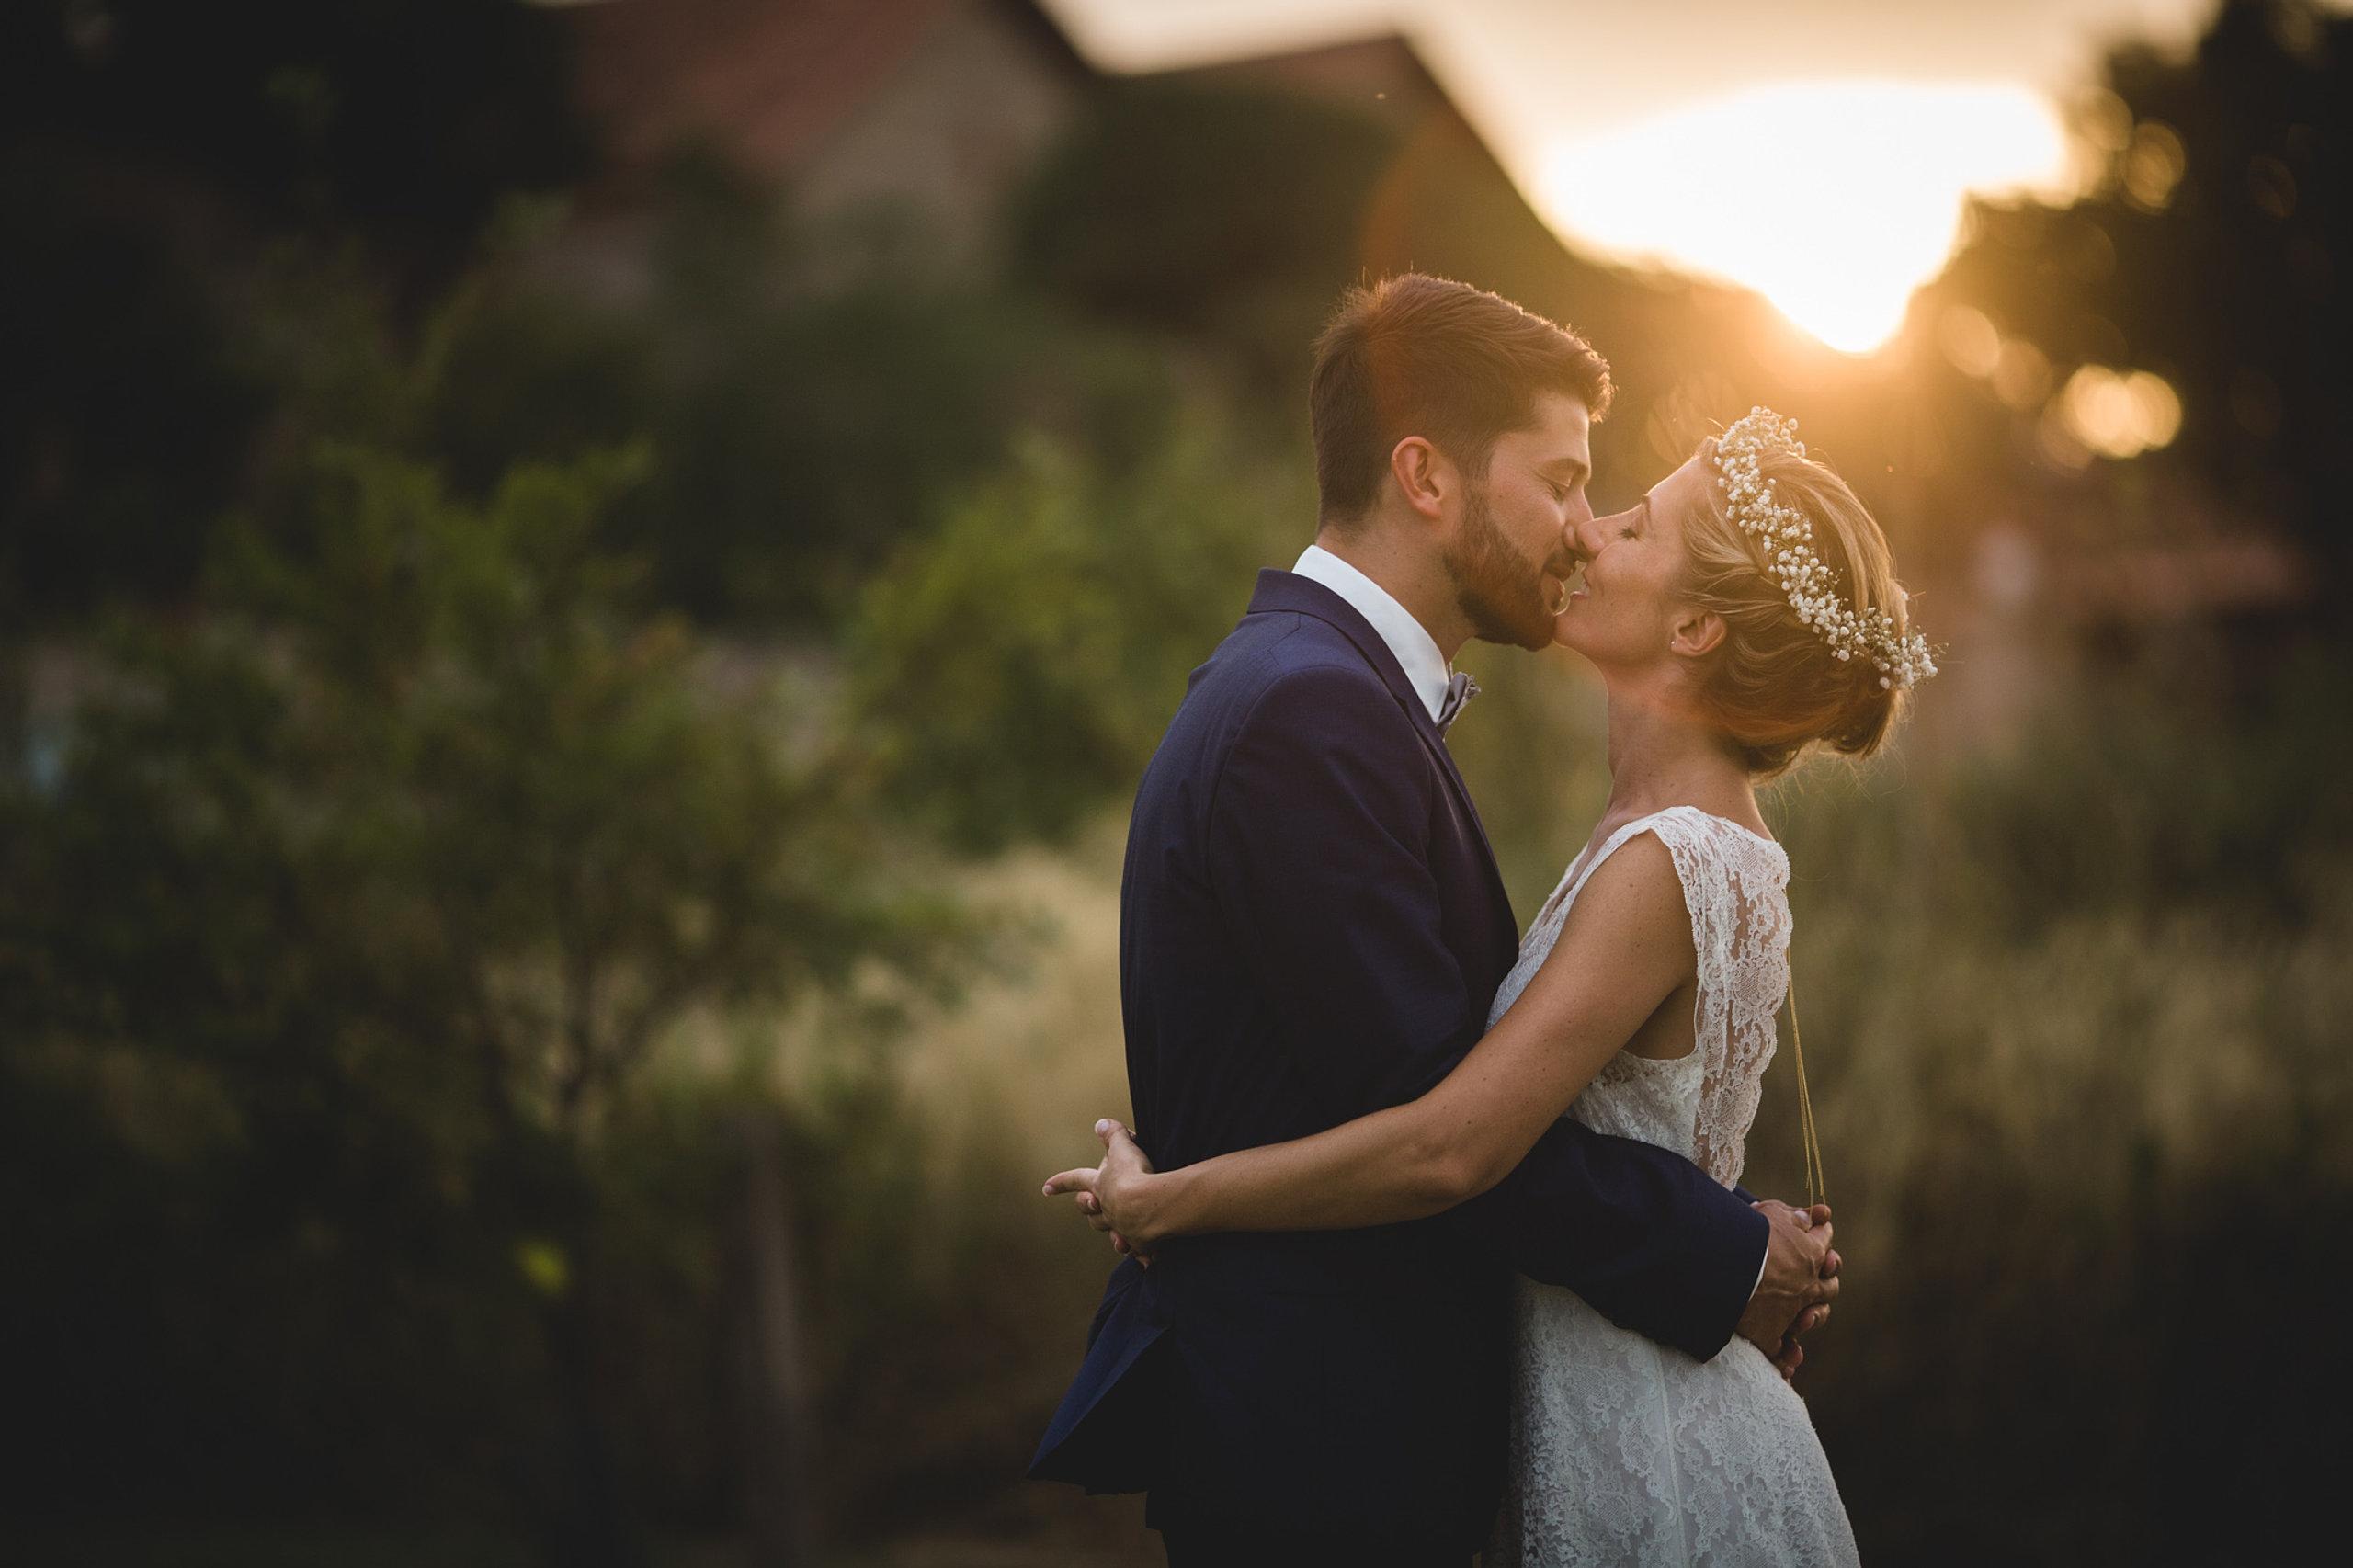 photographe mariage perpignan - Photographe Mariage Narbonne